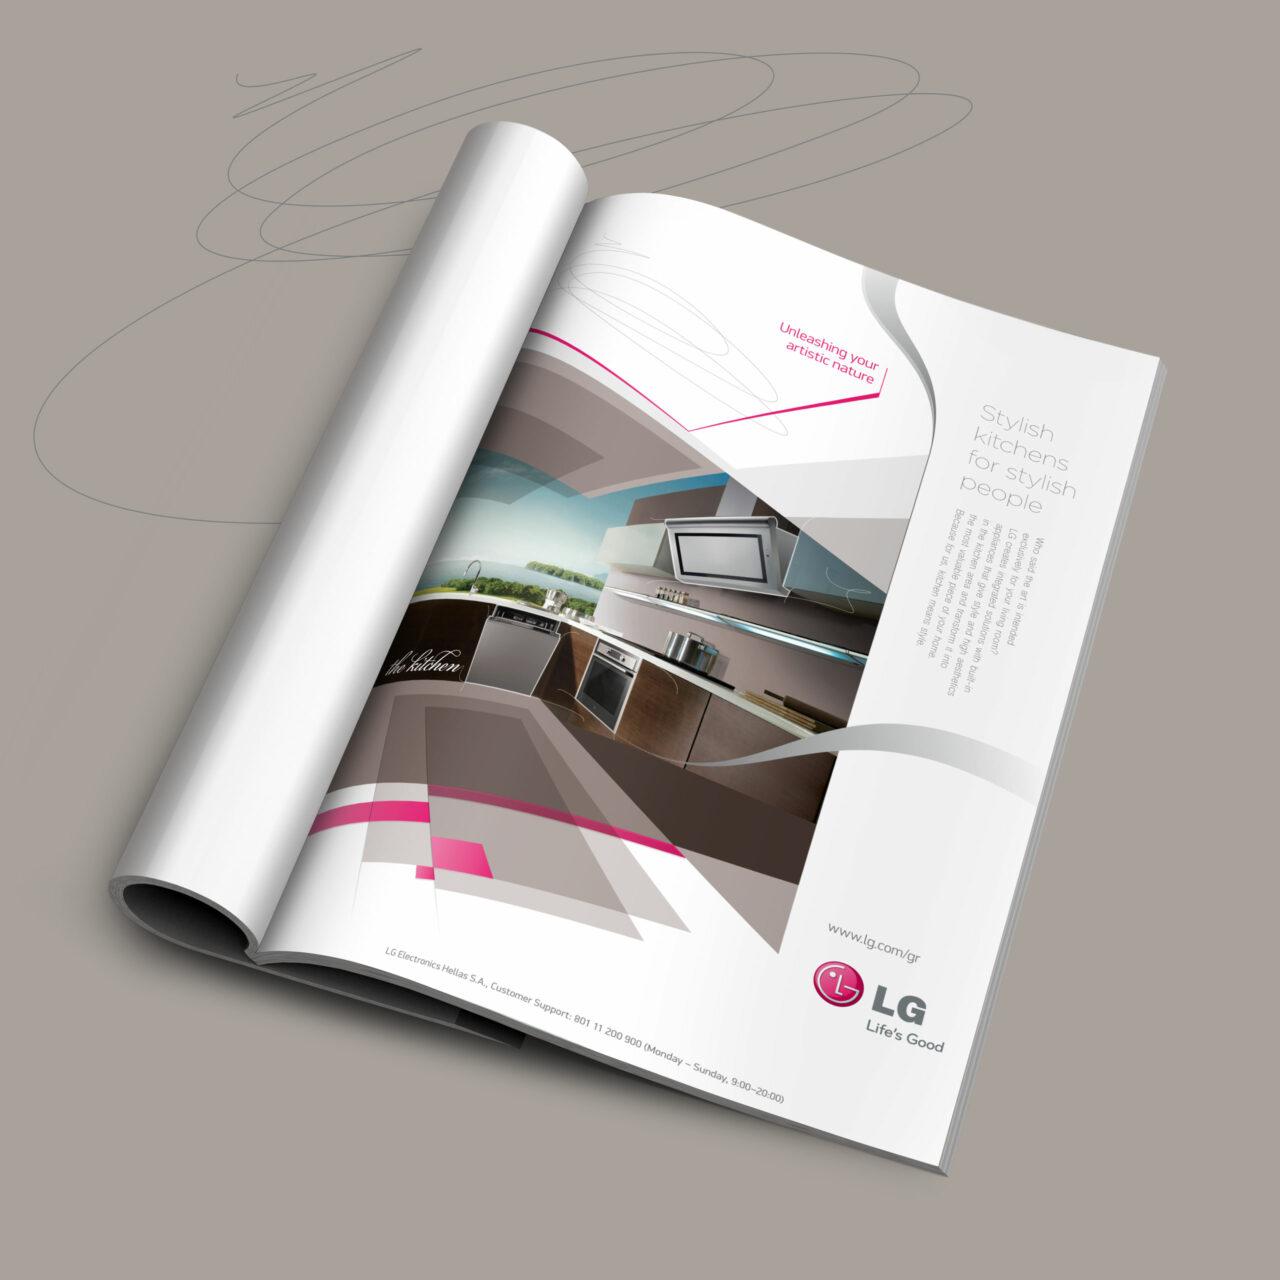 LG kitchen print ad preview mockup design